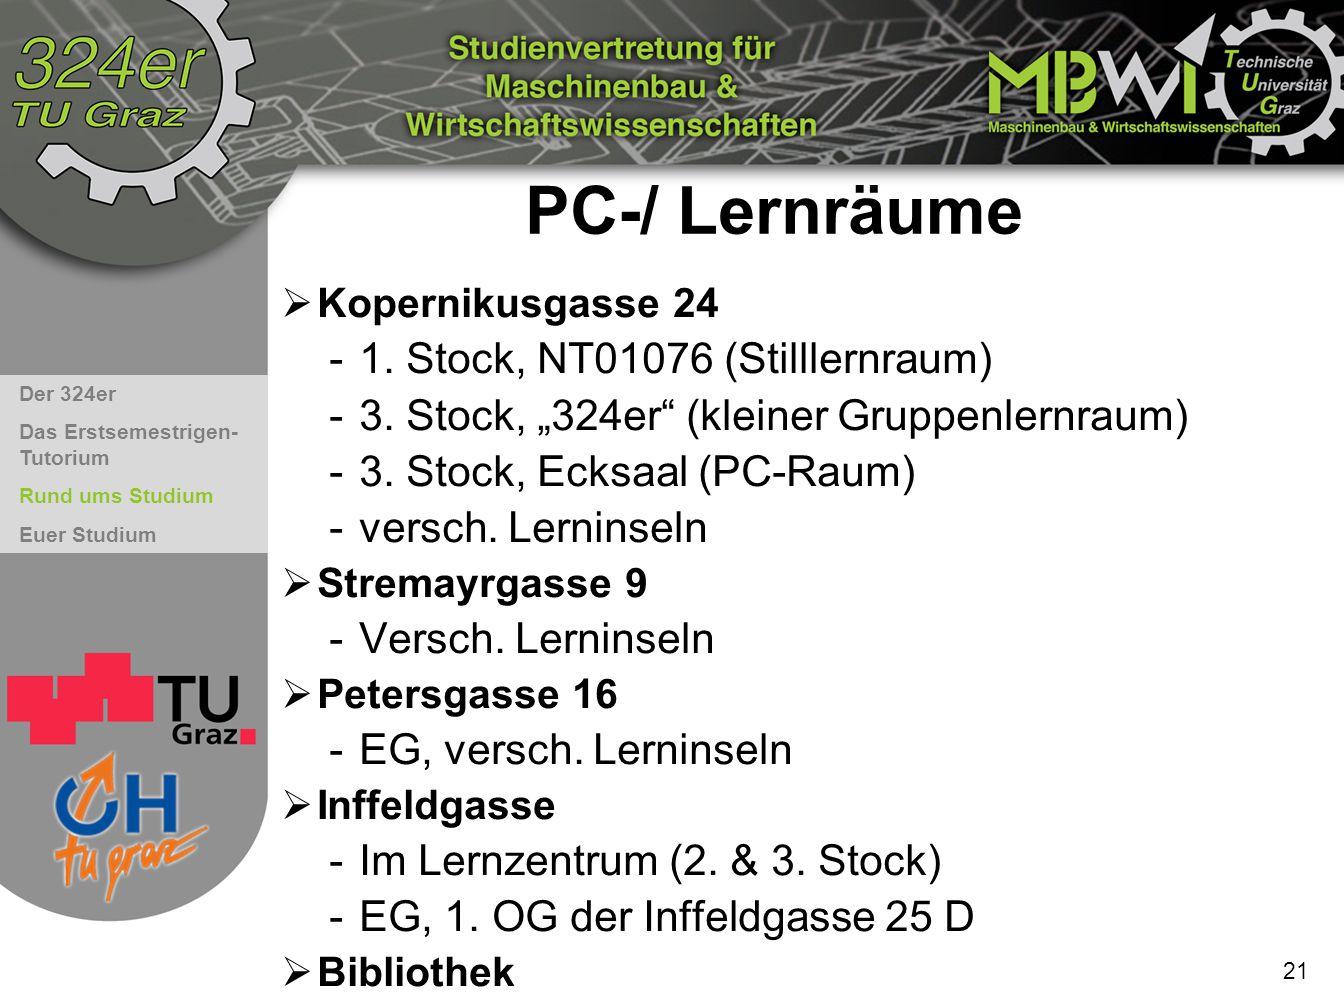 PC-/ Lernräume 1. Stock, NT01076 (Stilllernraum)